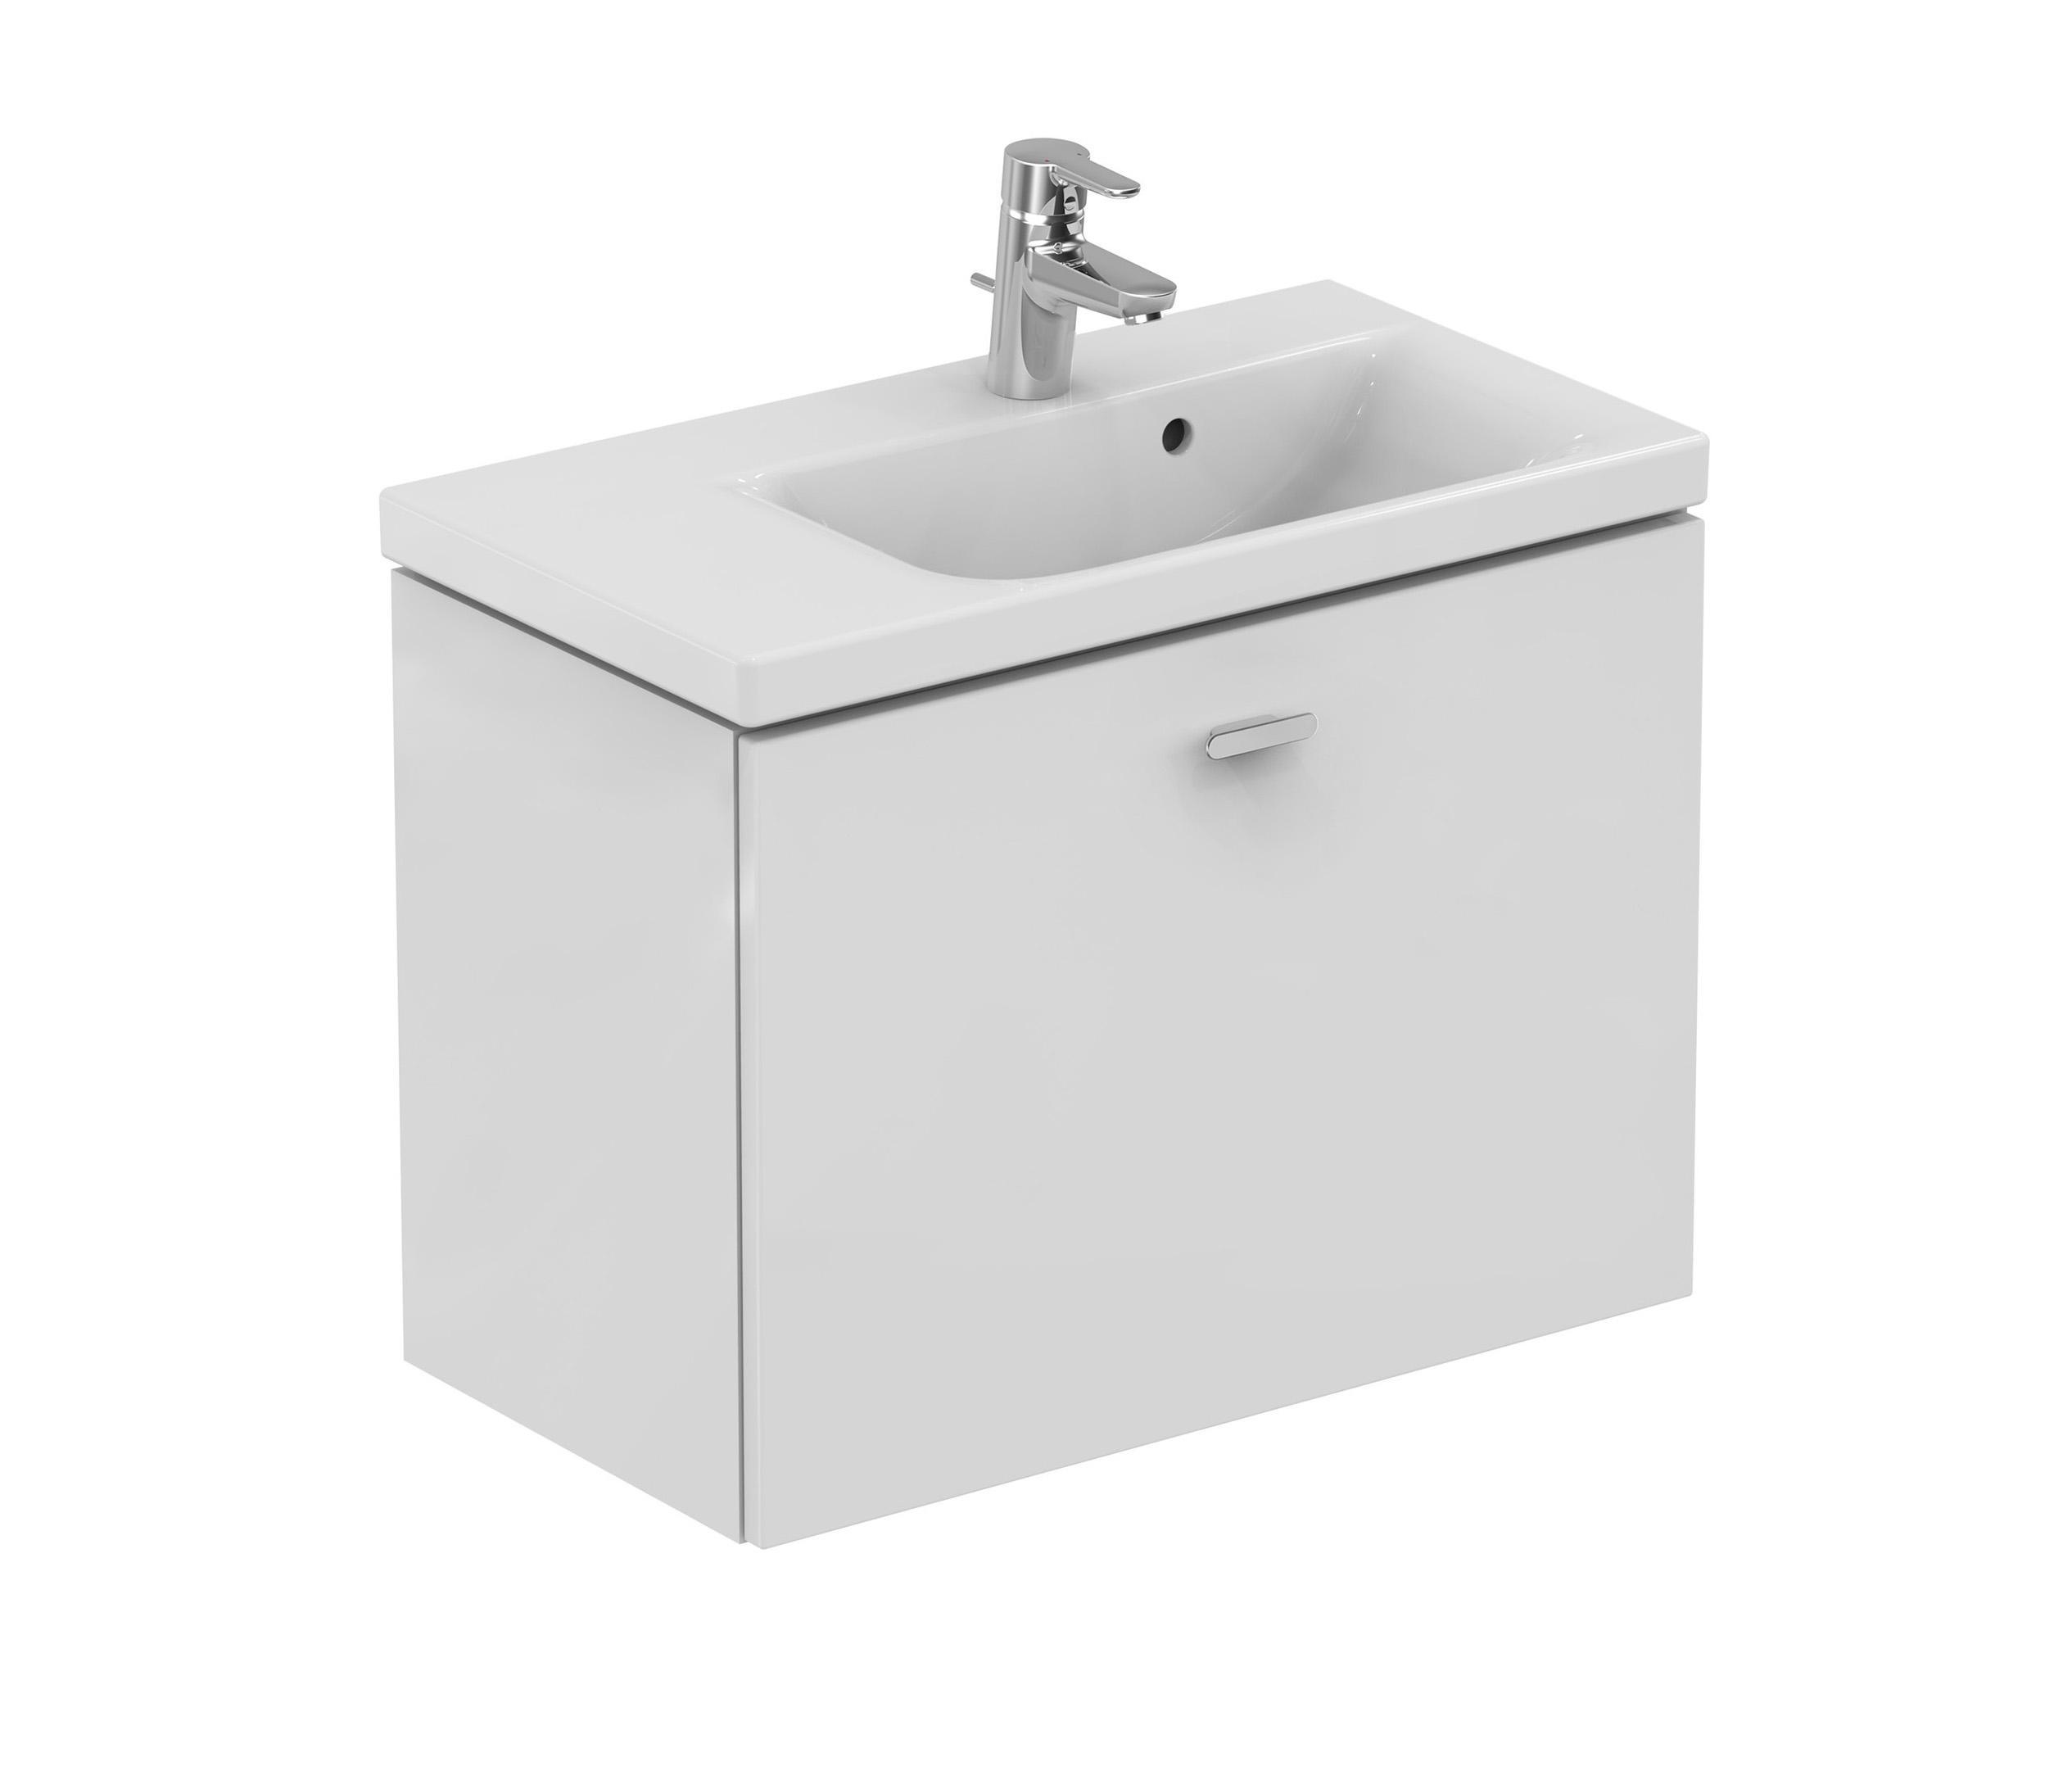 connect space waschtisch unterschrank 700 mm ablage links vanity units from ideal standard. Black Bedroom Furniture Sets. Home Design Ideas